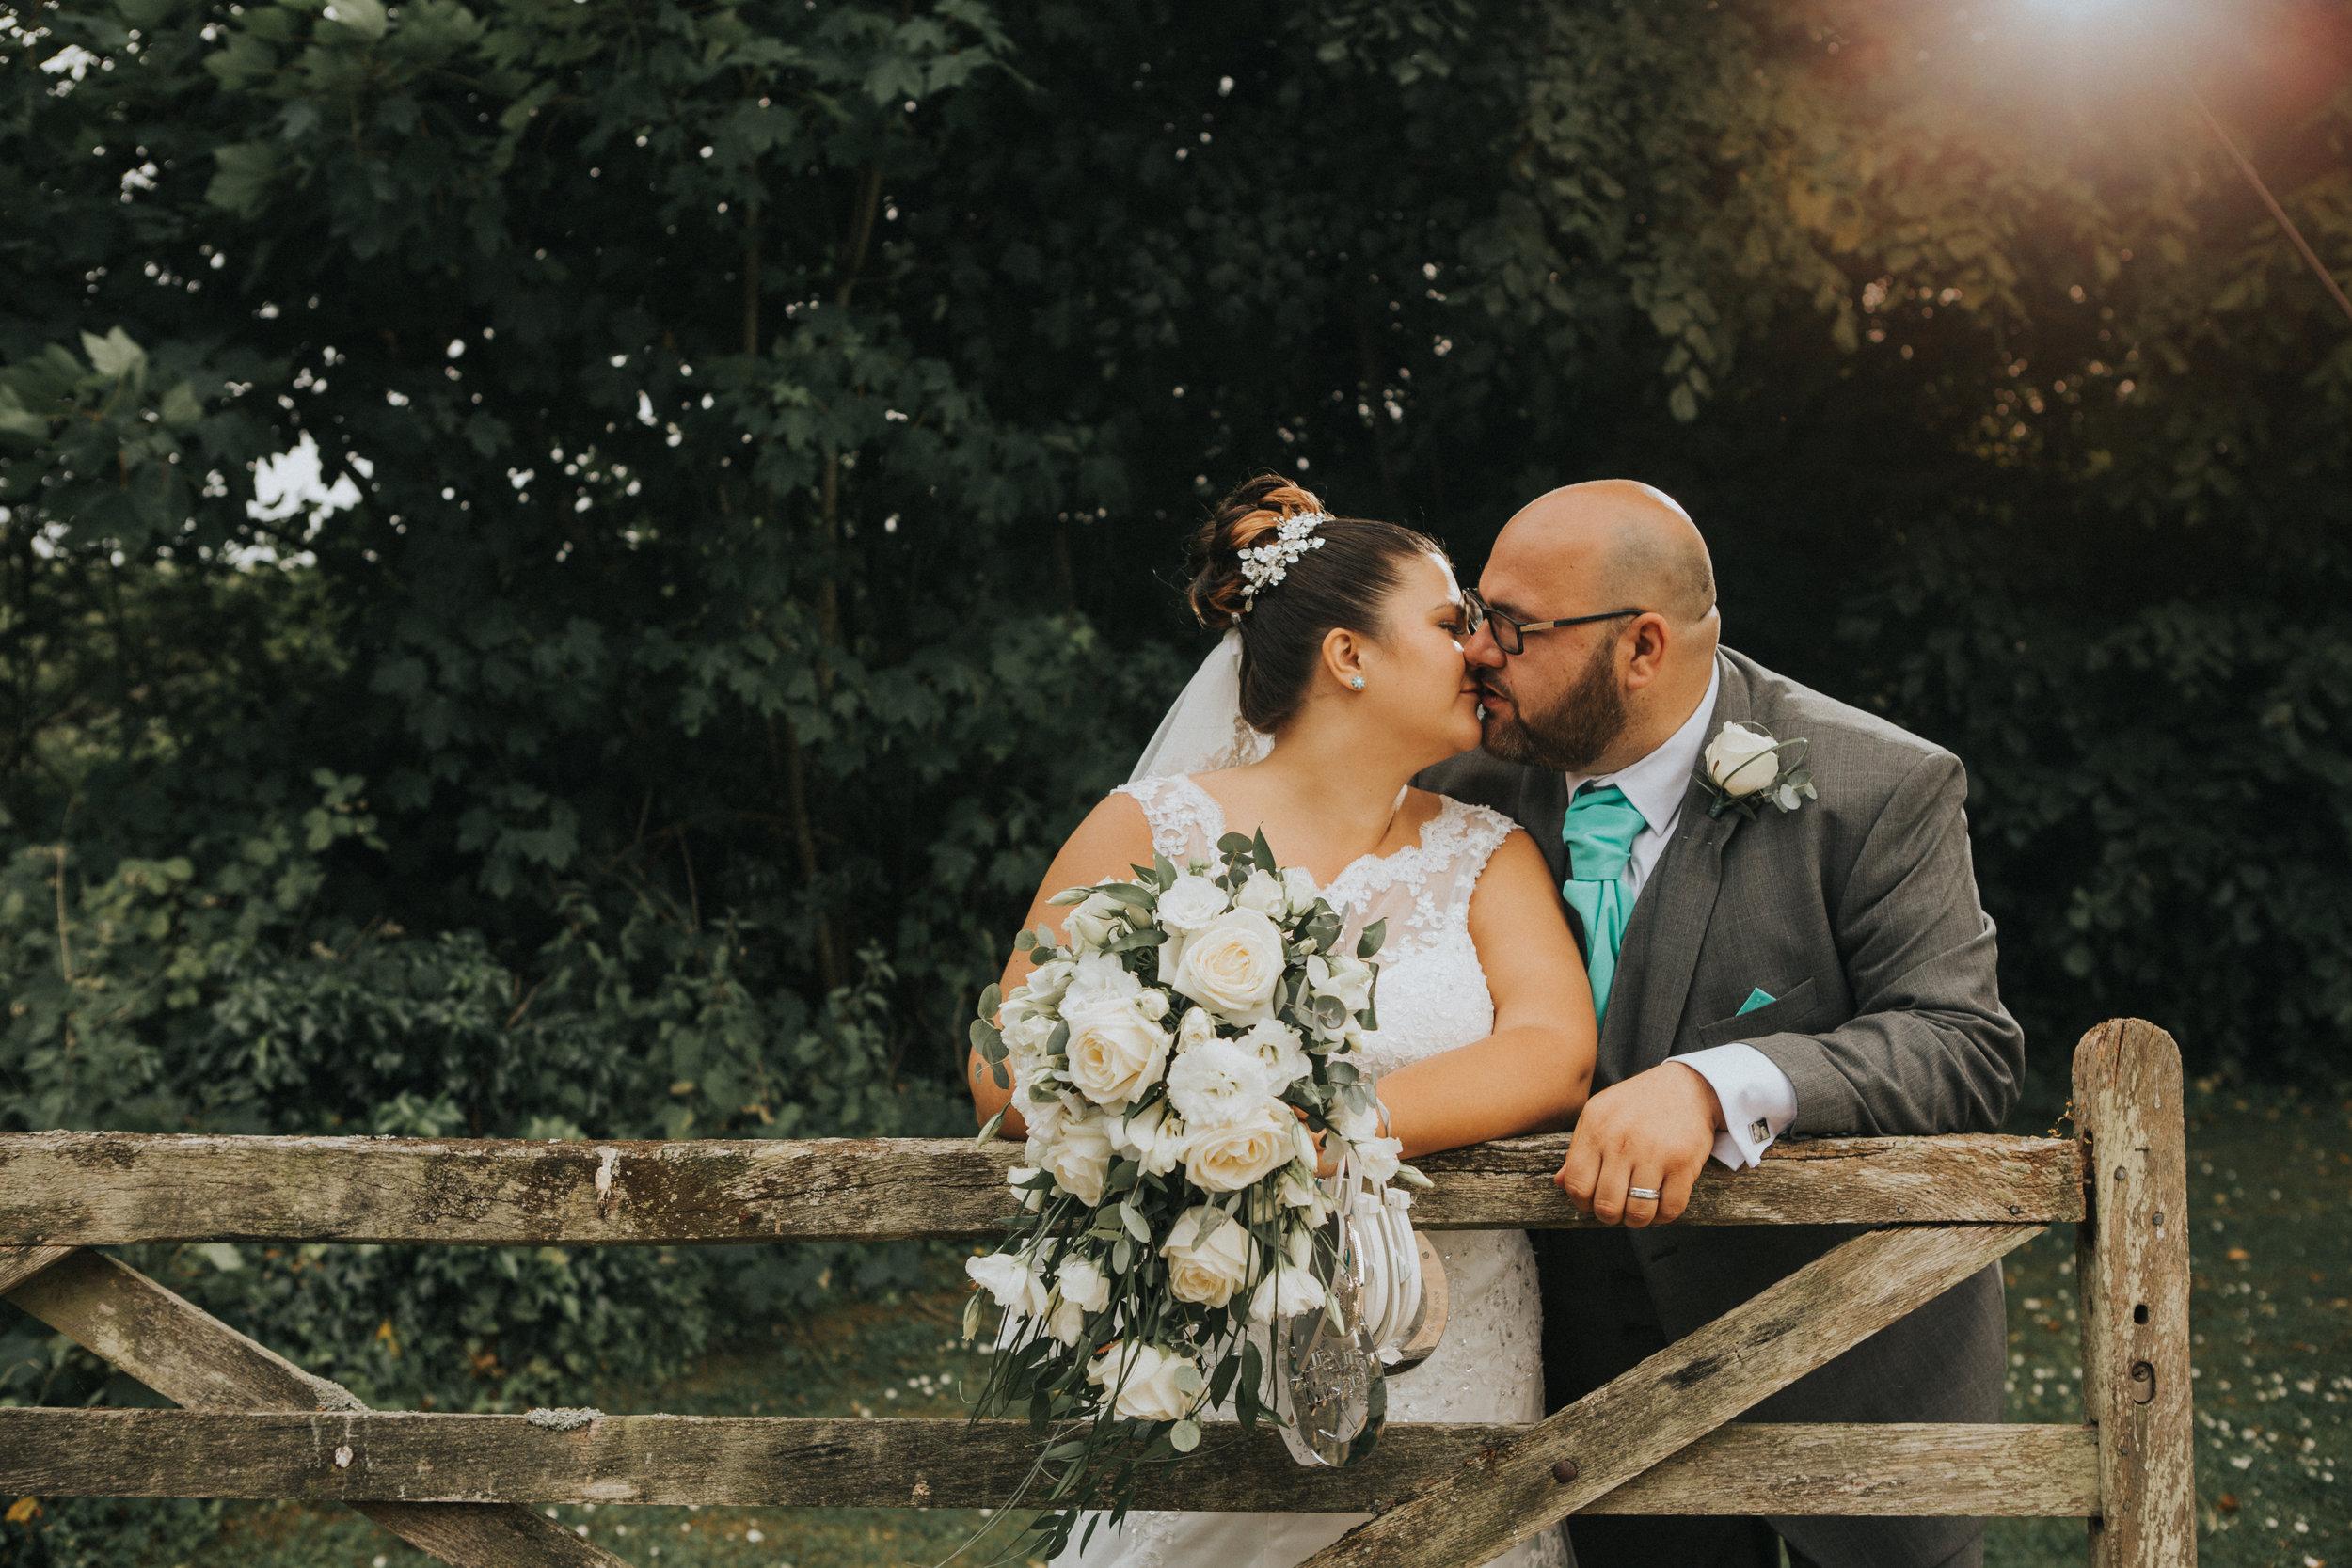 westenhangar-castle-kent-london-wedding-photography-portrait-54